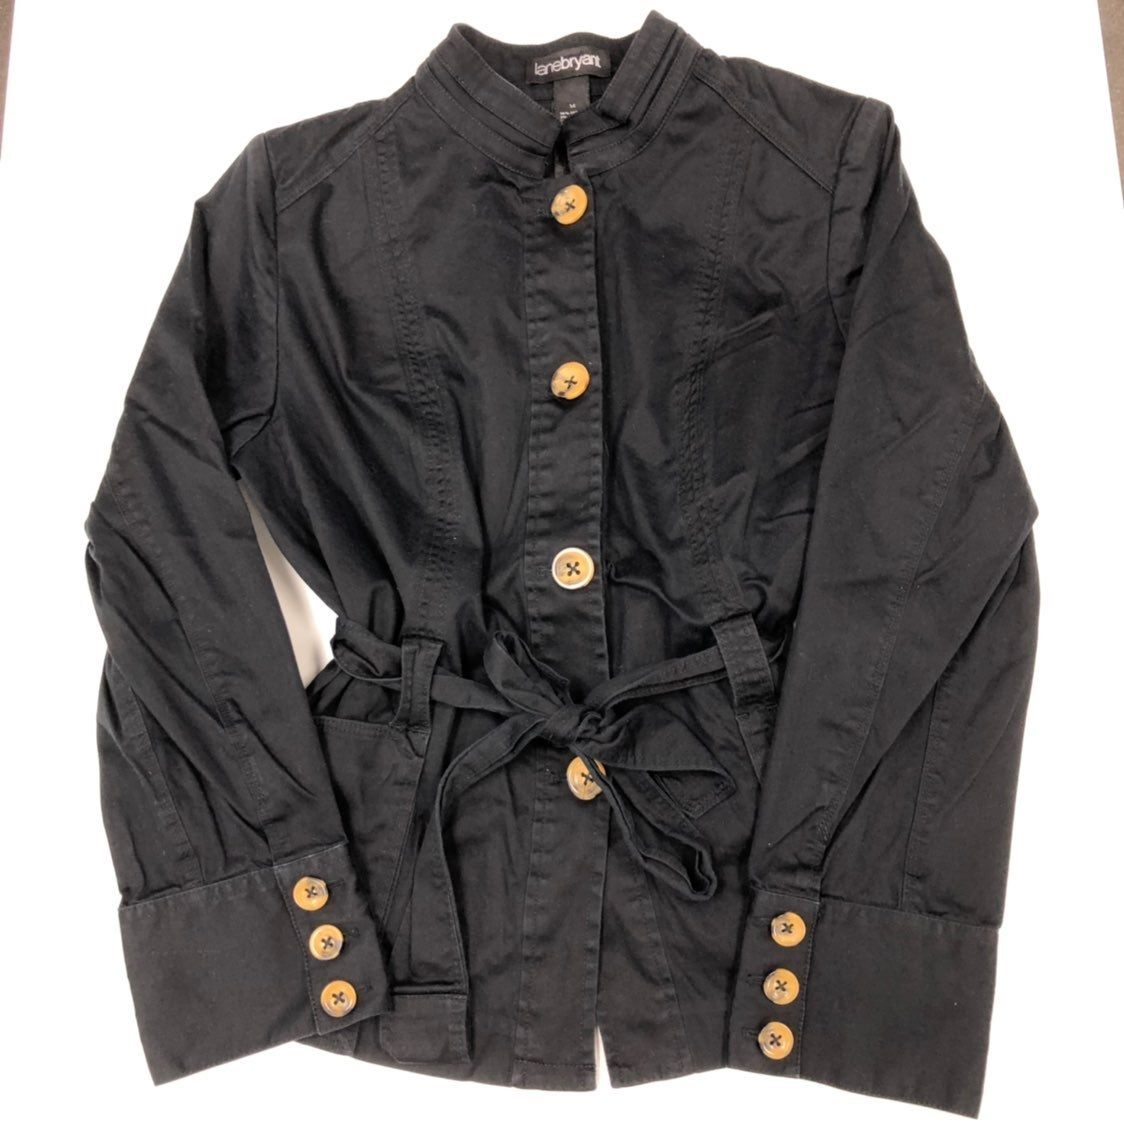 Lane Bryant Black Button Coat Jacket